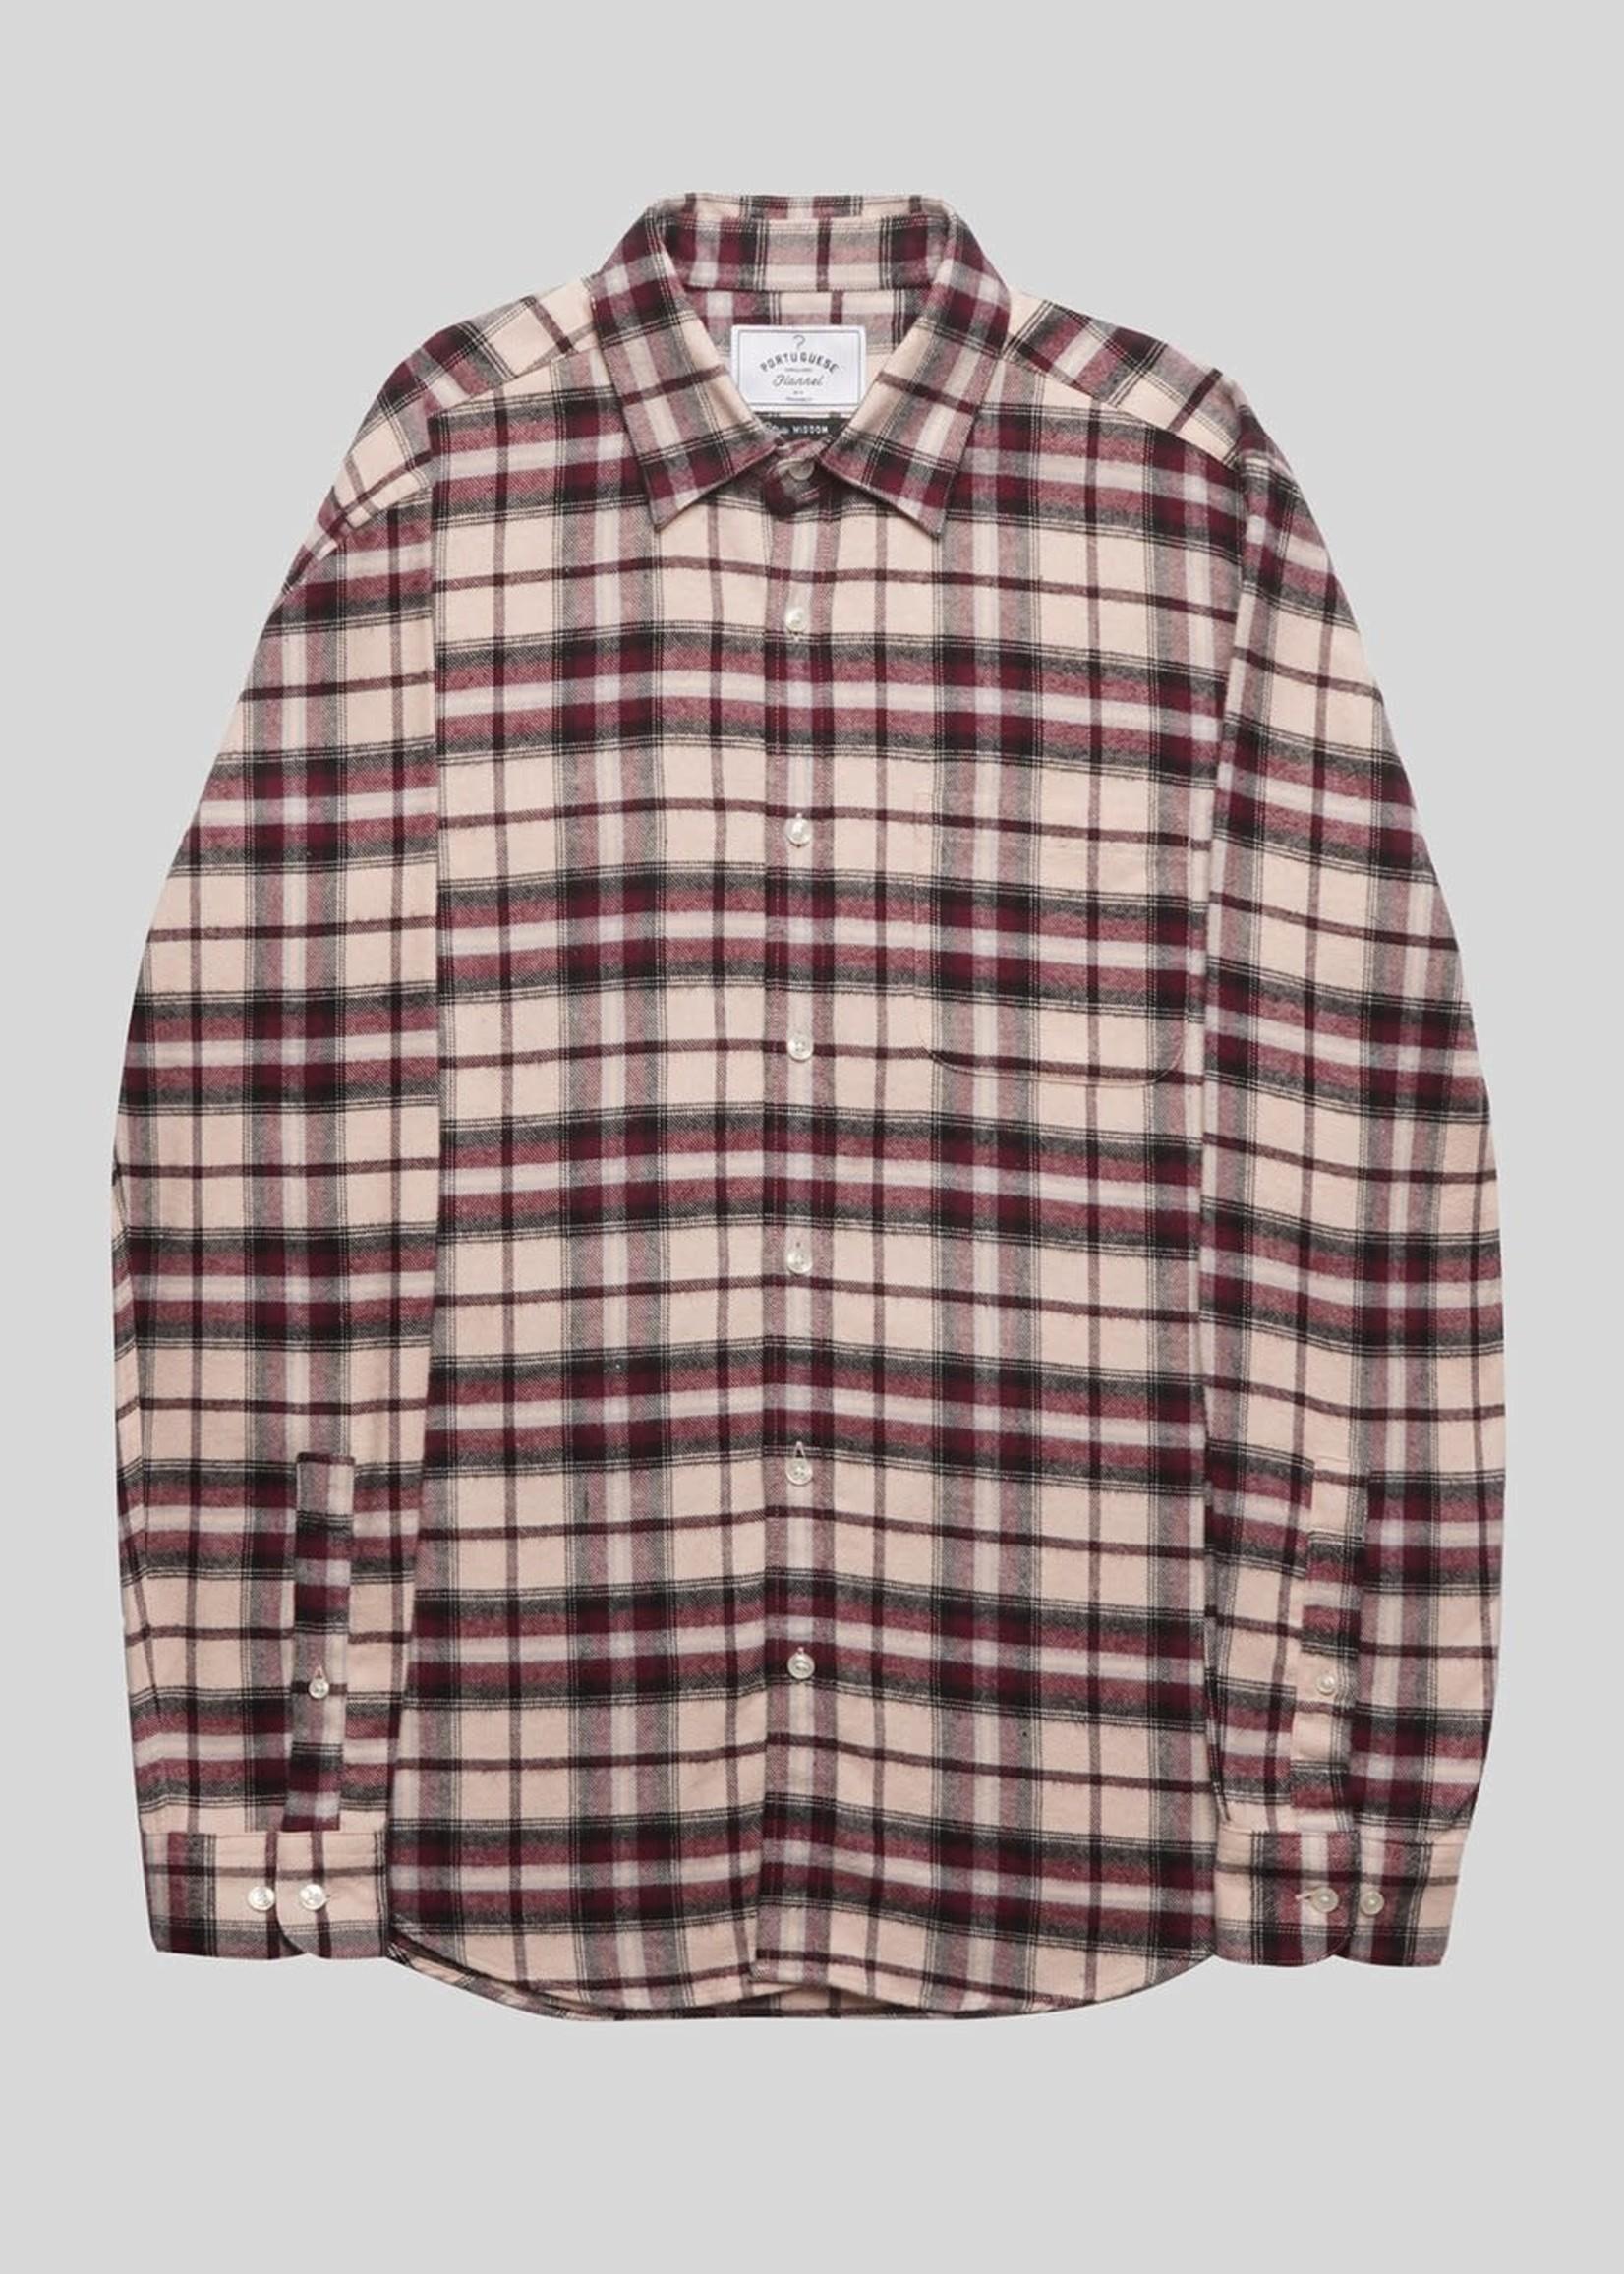 Portuguese Flannel Portuguese Flannel Raspberry Black White Raspberry Plaid Flannel Sport Shirt